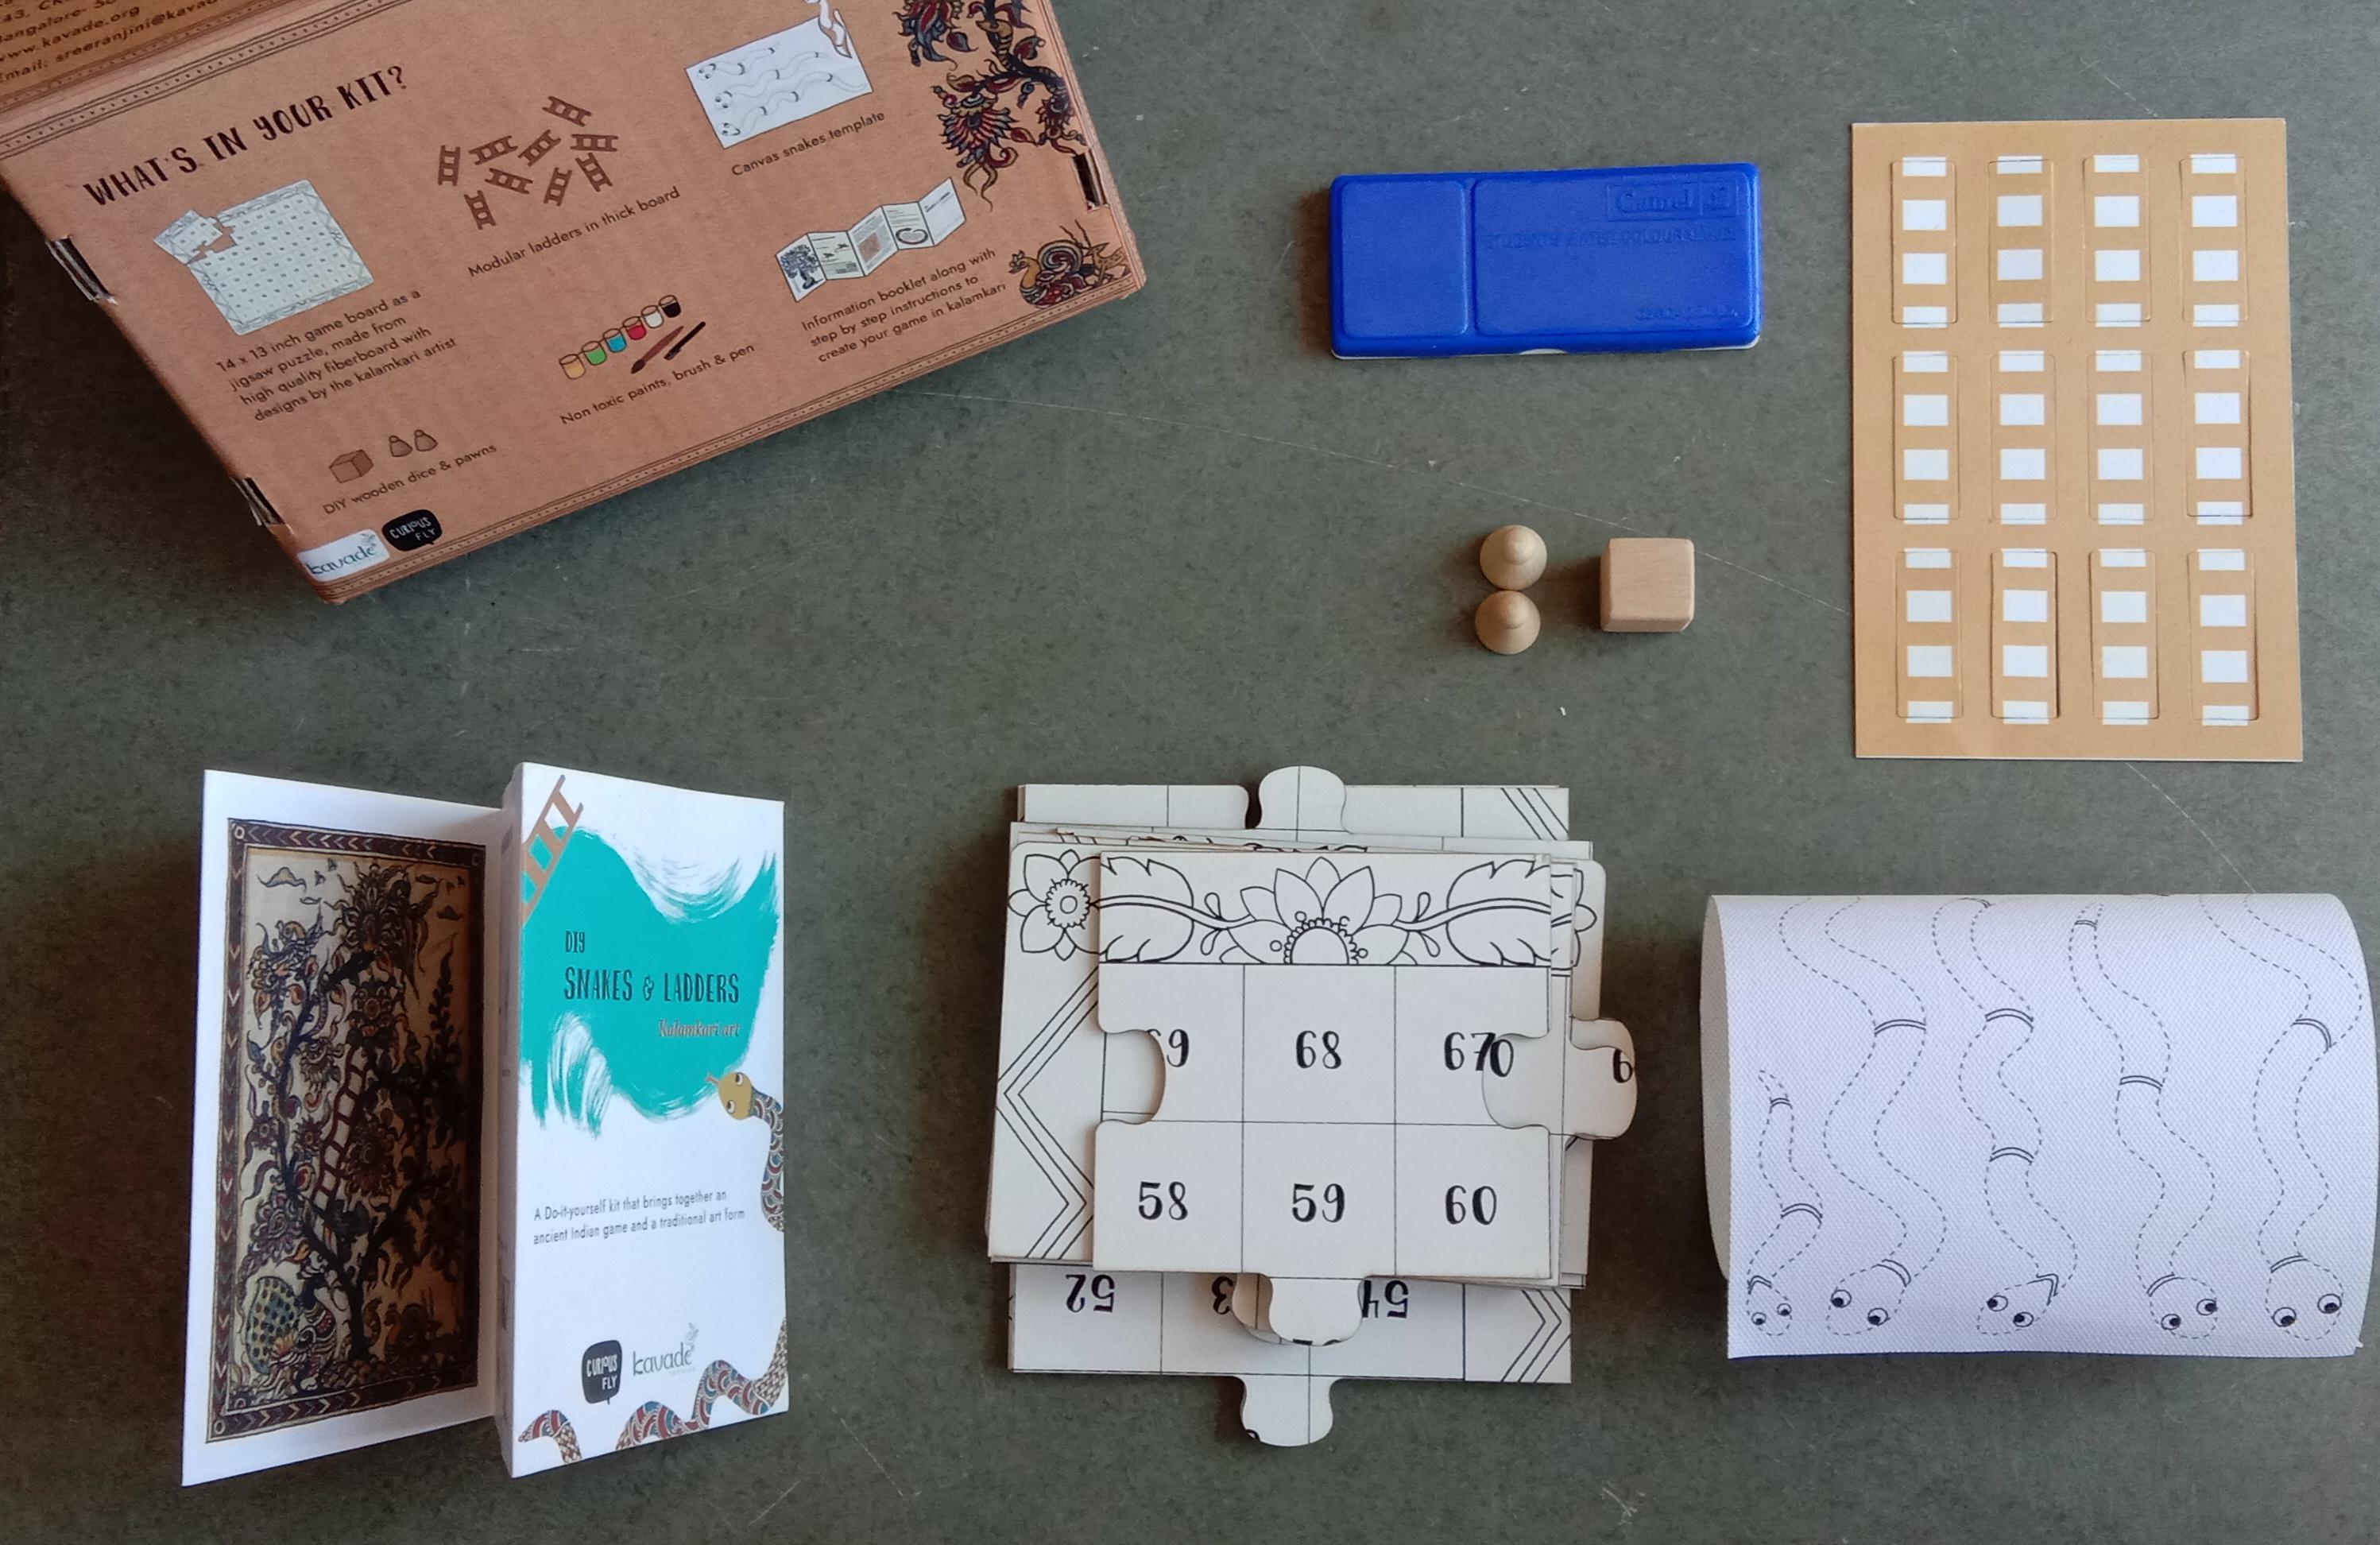 DIY Snakes & Ladders Jigsaw puzzle kit: Kalamkari art